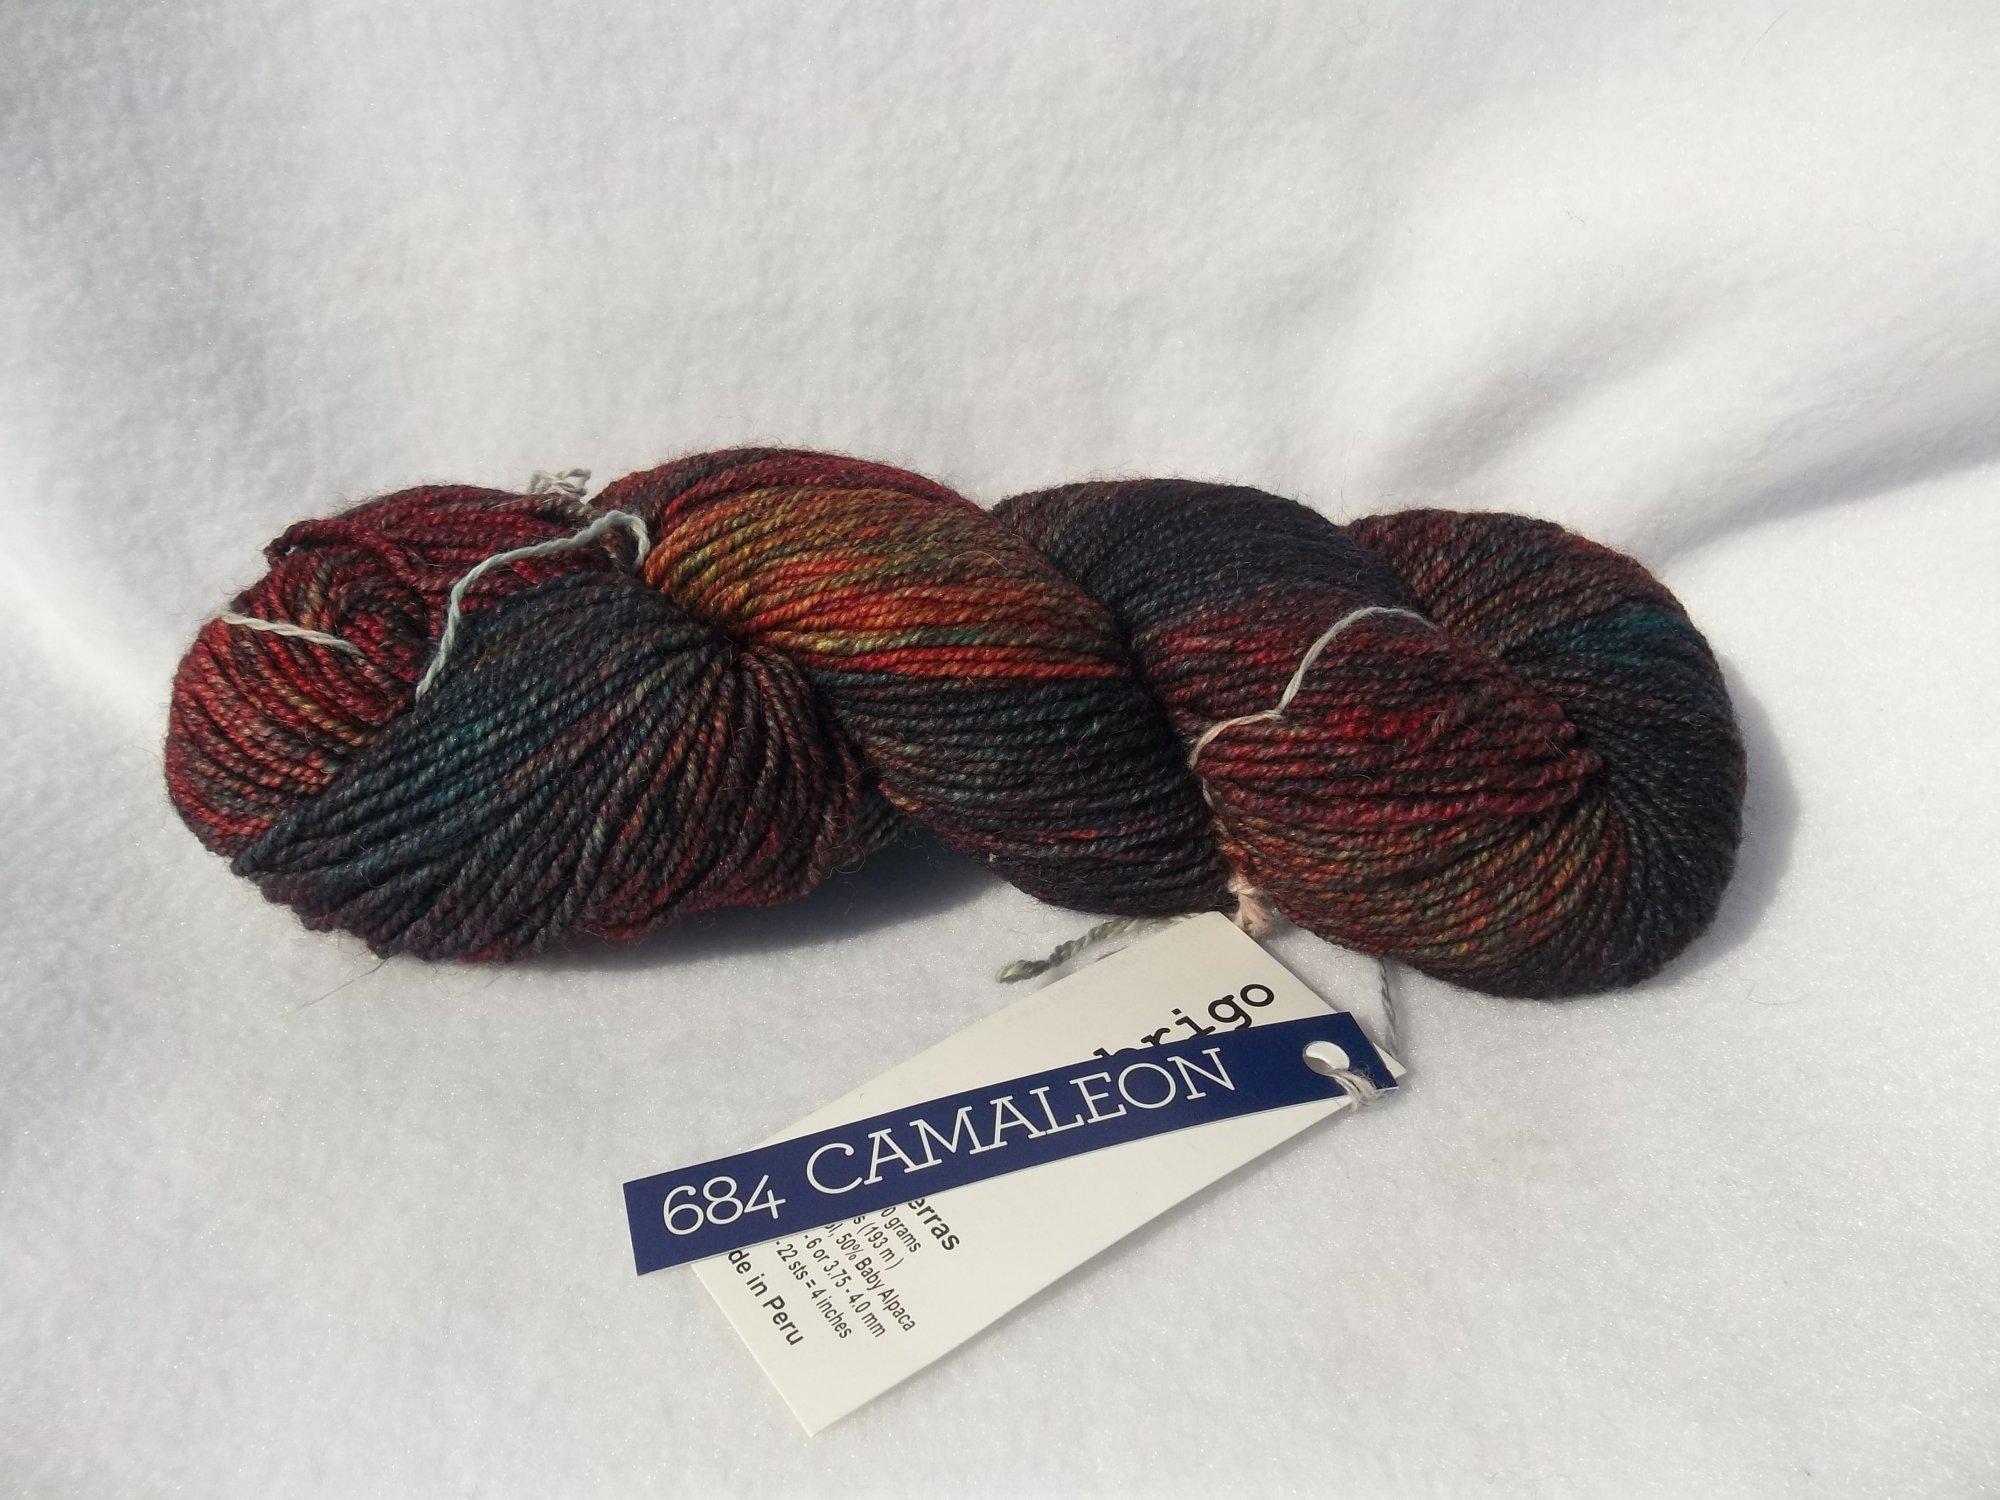 Dos Tierras - Camaleon - 684